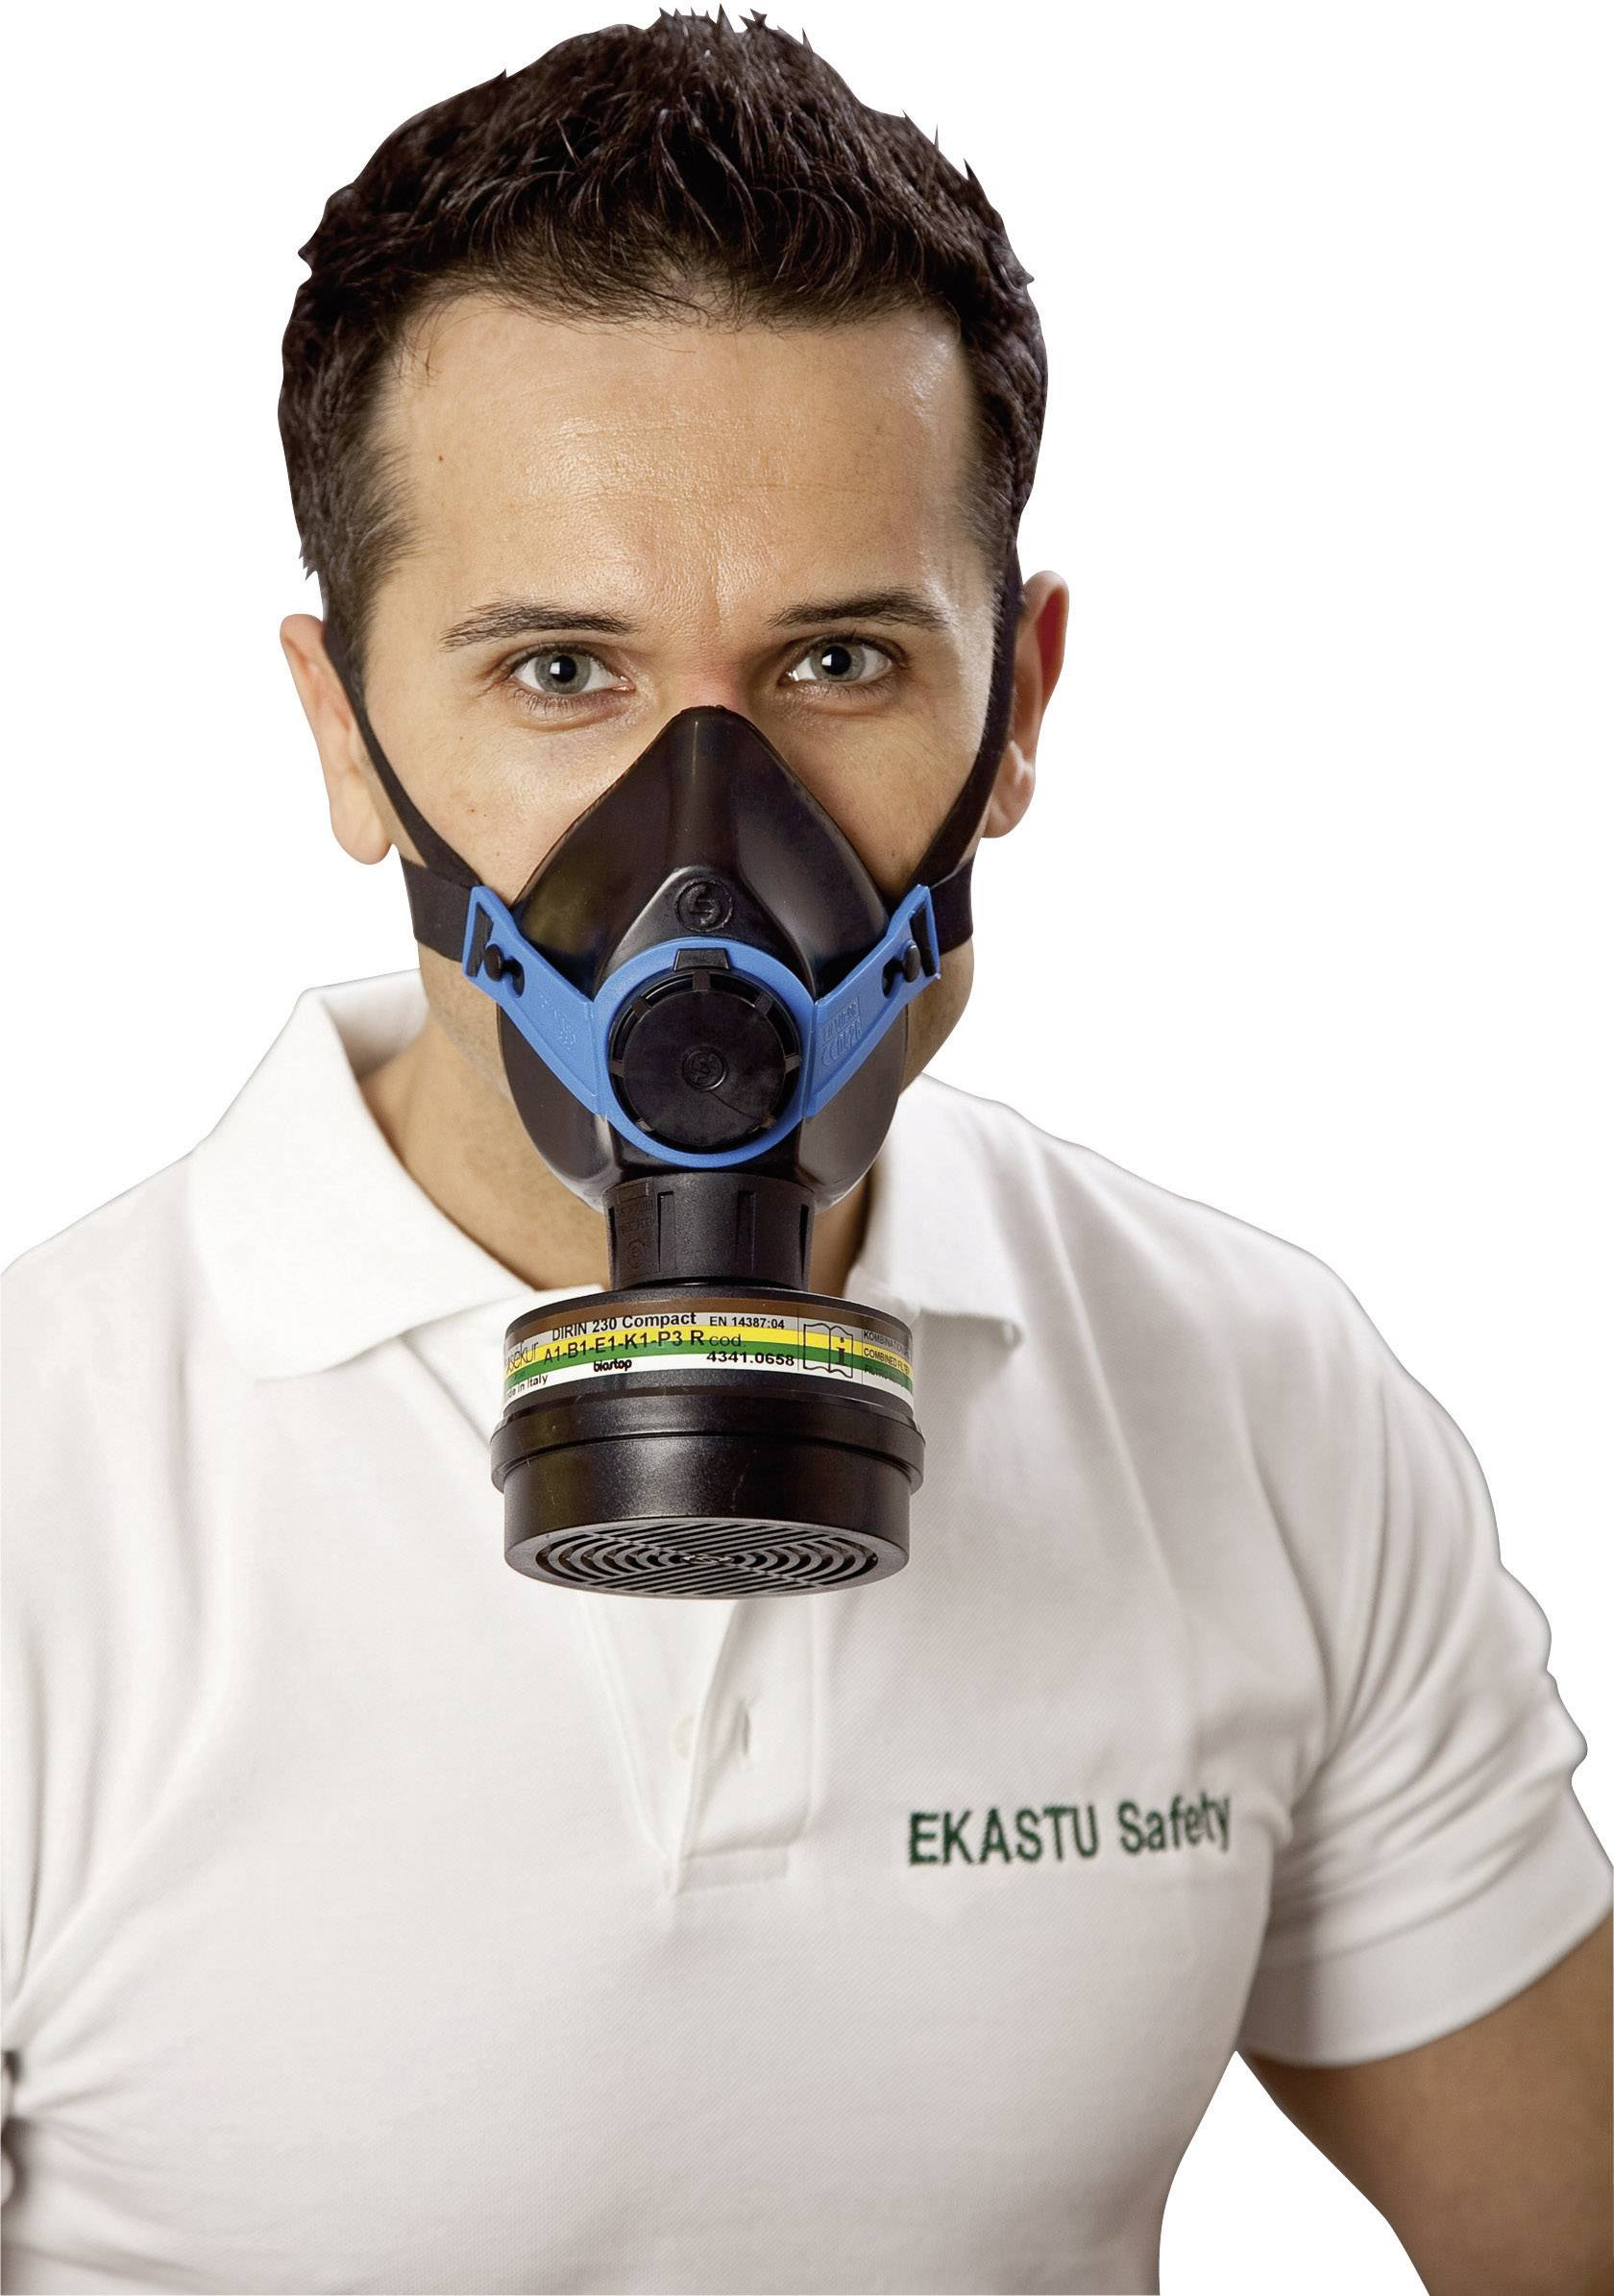 Respiračná polomaska Ekastu SEKURA Safety Colorex multi A1B1E1K1-P3R